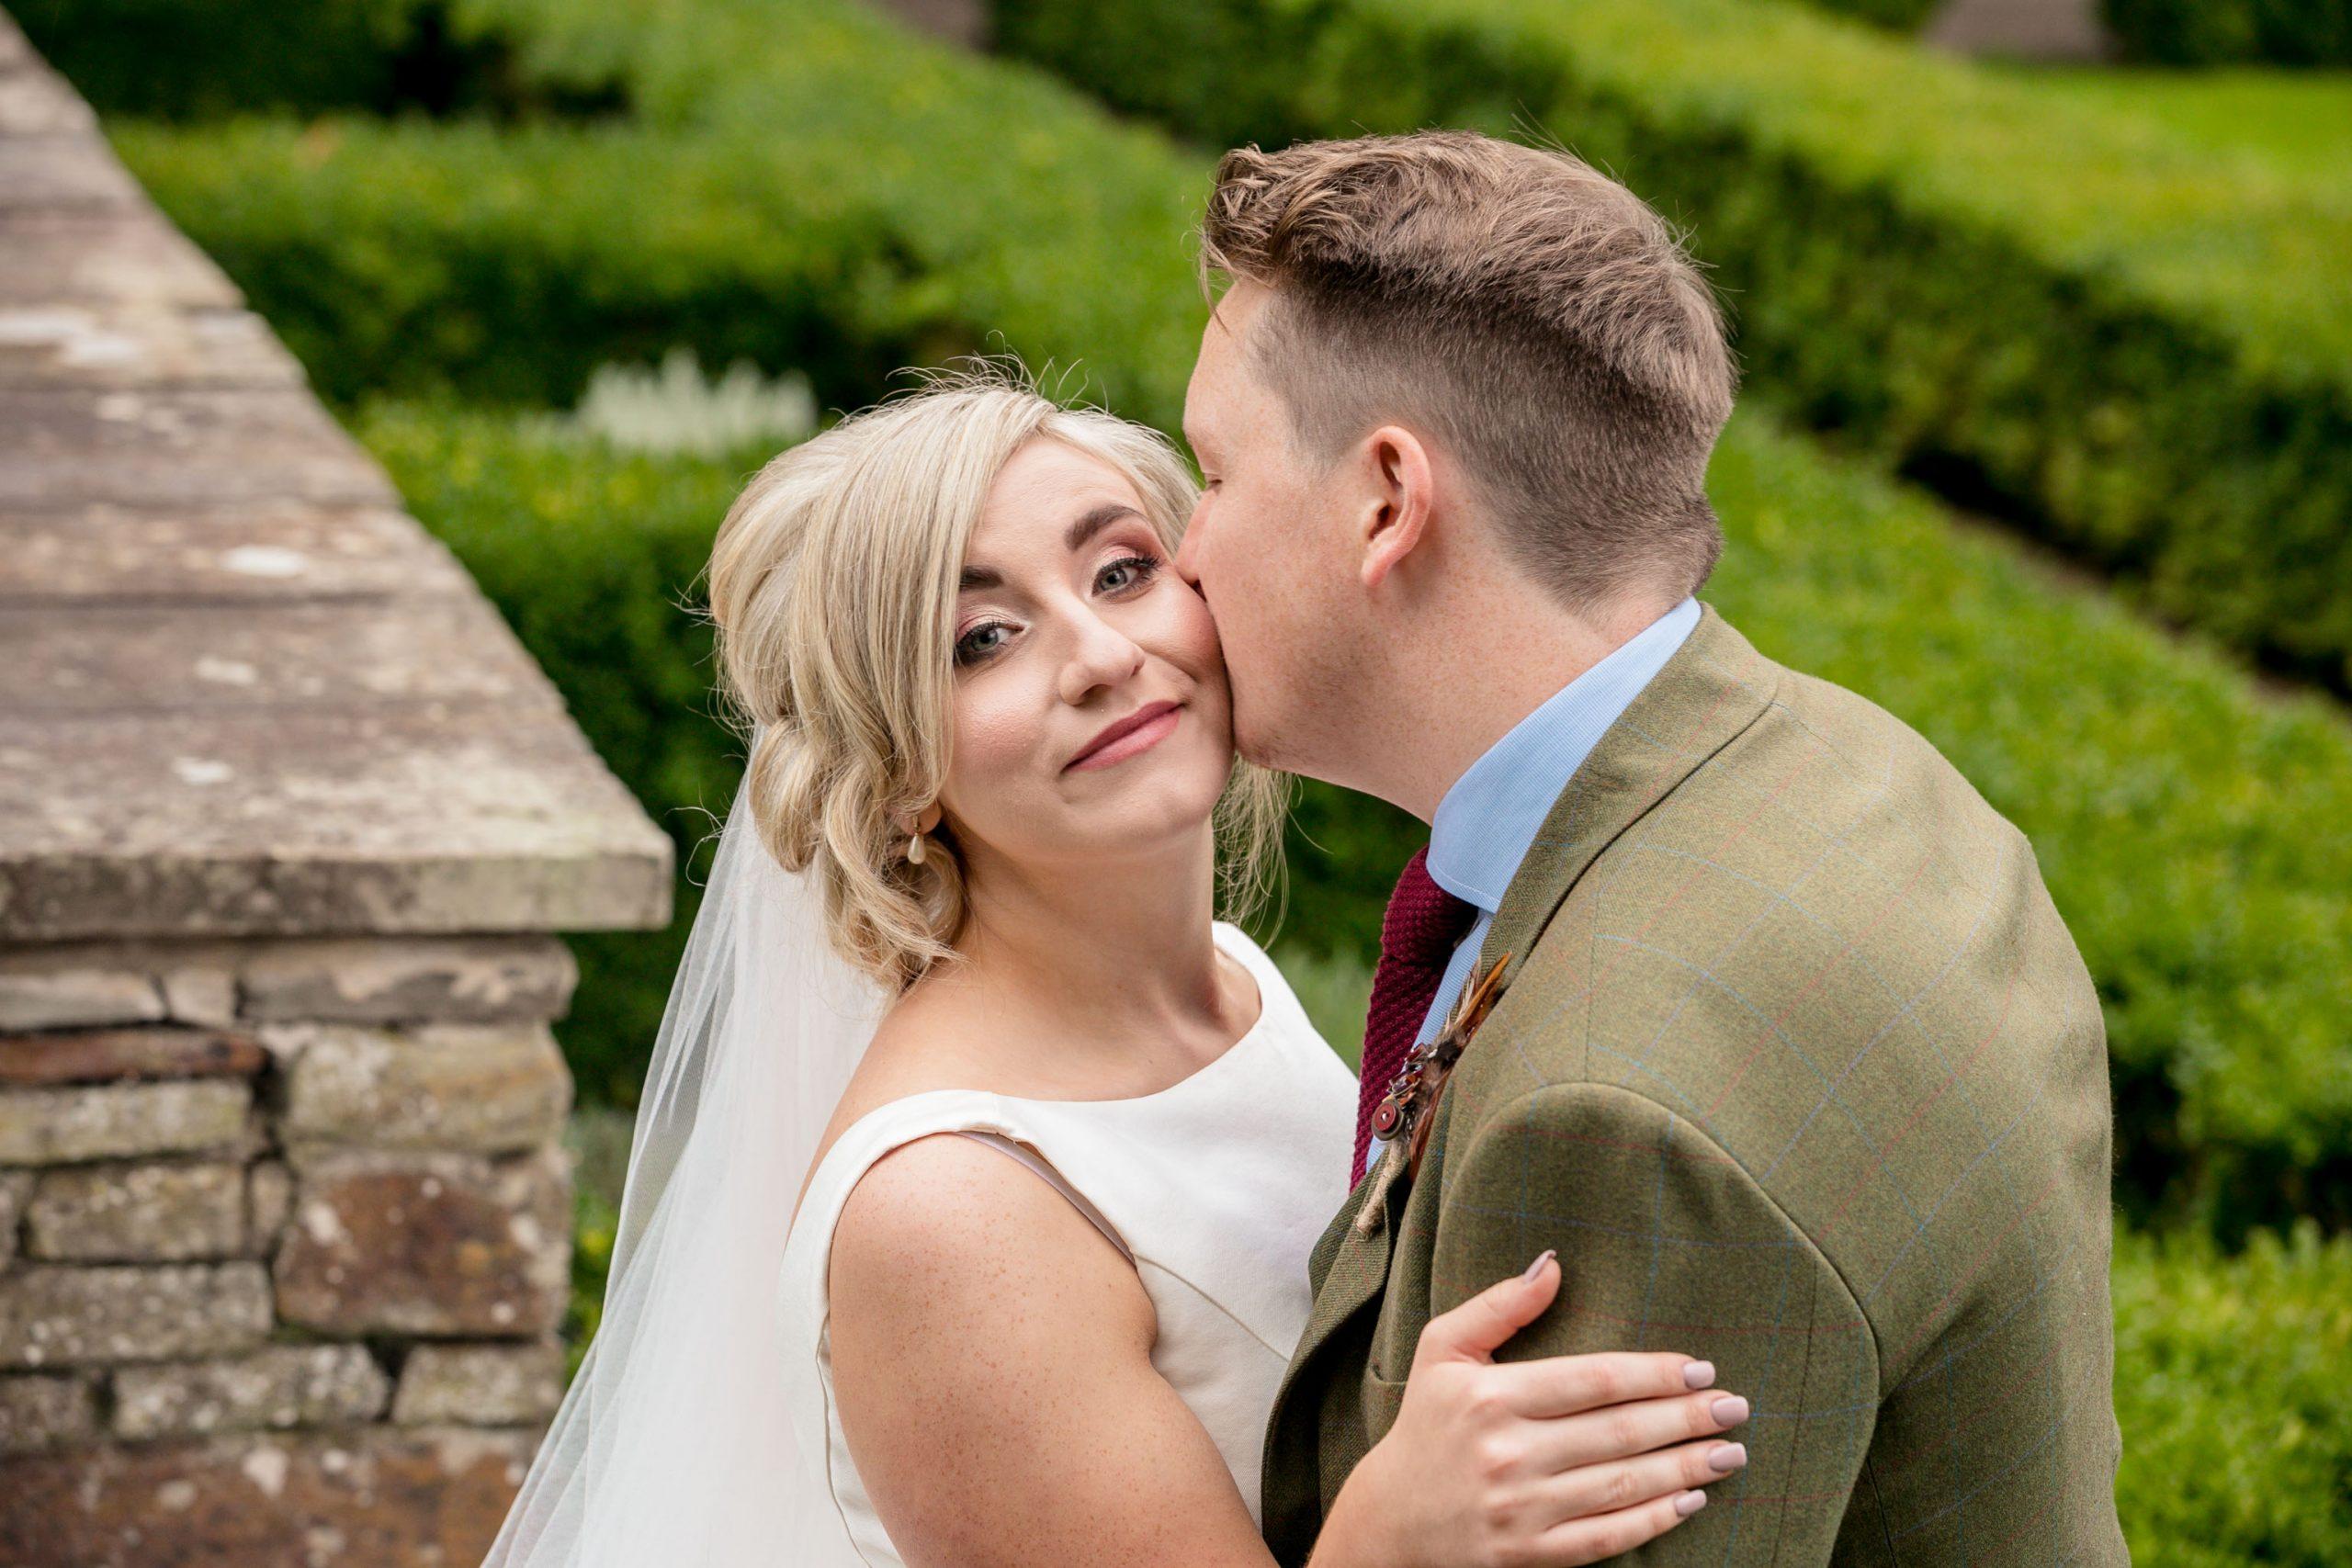 Wedding of Sam & Jaz at Llancaich Fawr, Tania Miller Photography, Caerphilly Wedding Photographer